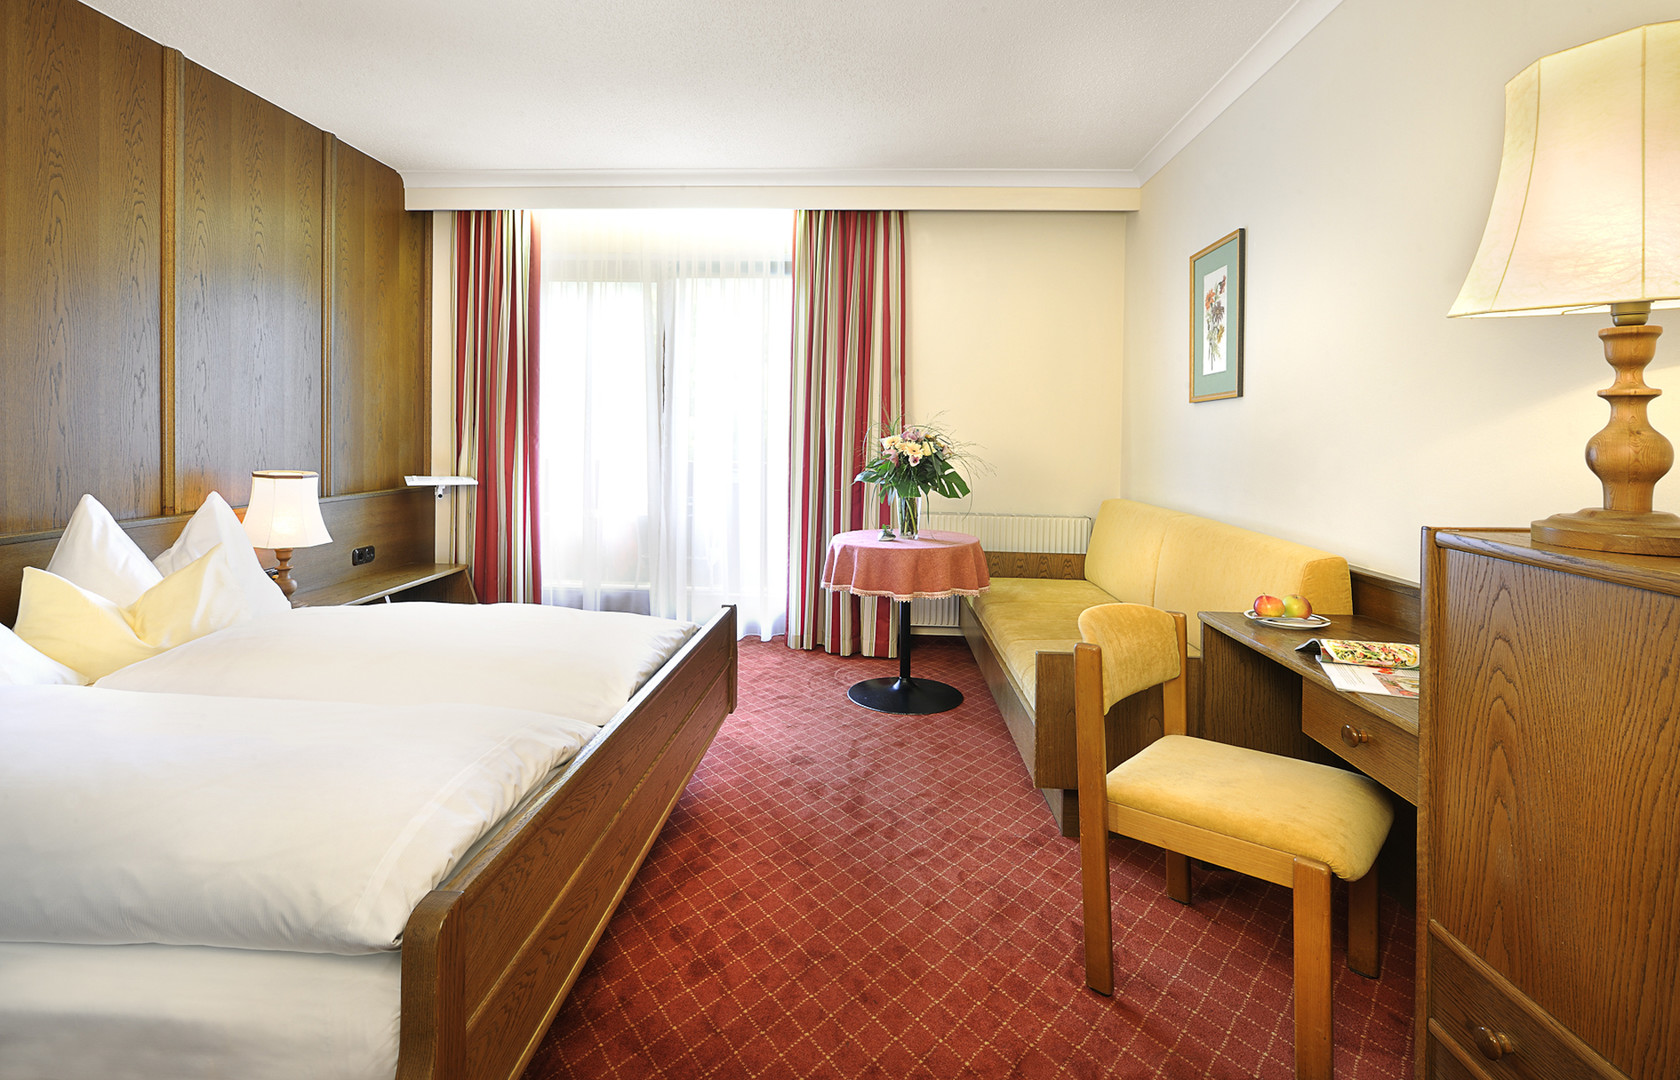 Hotel St. Hubertus Lofer #3